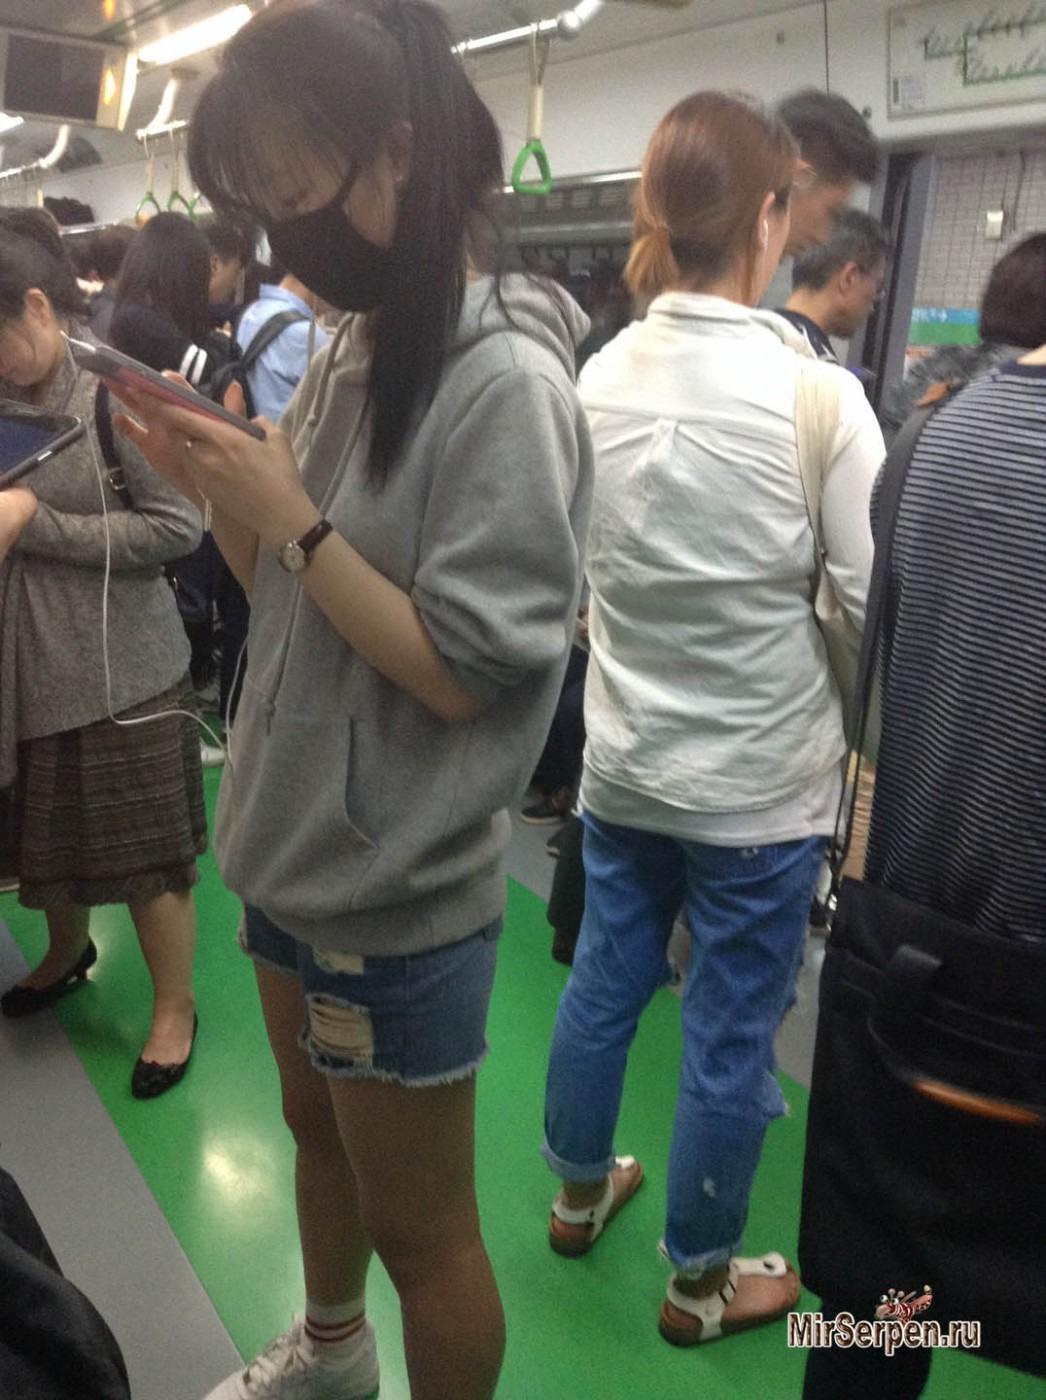 Азиатки в метро, фото голой девушки в душе